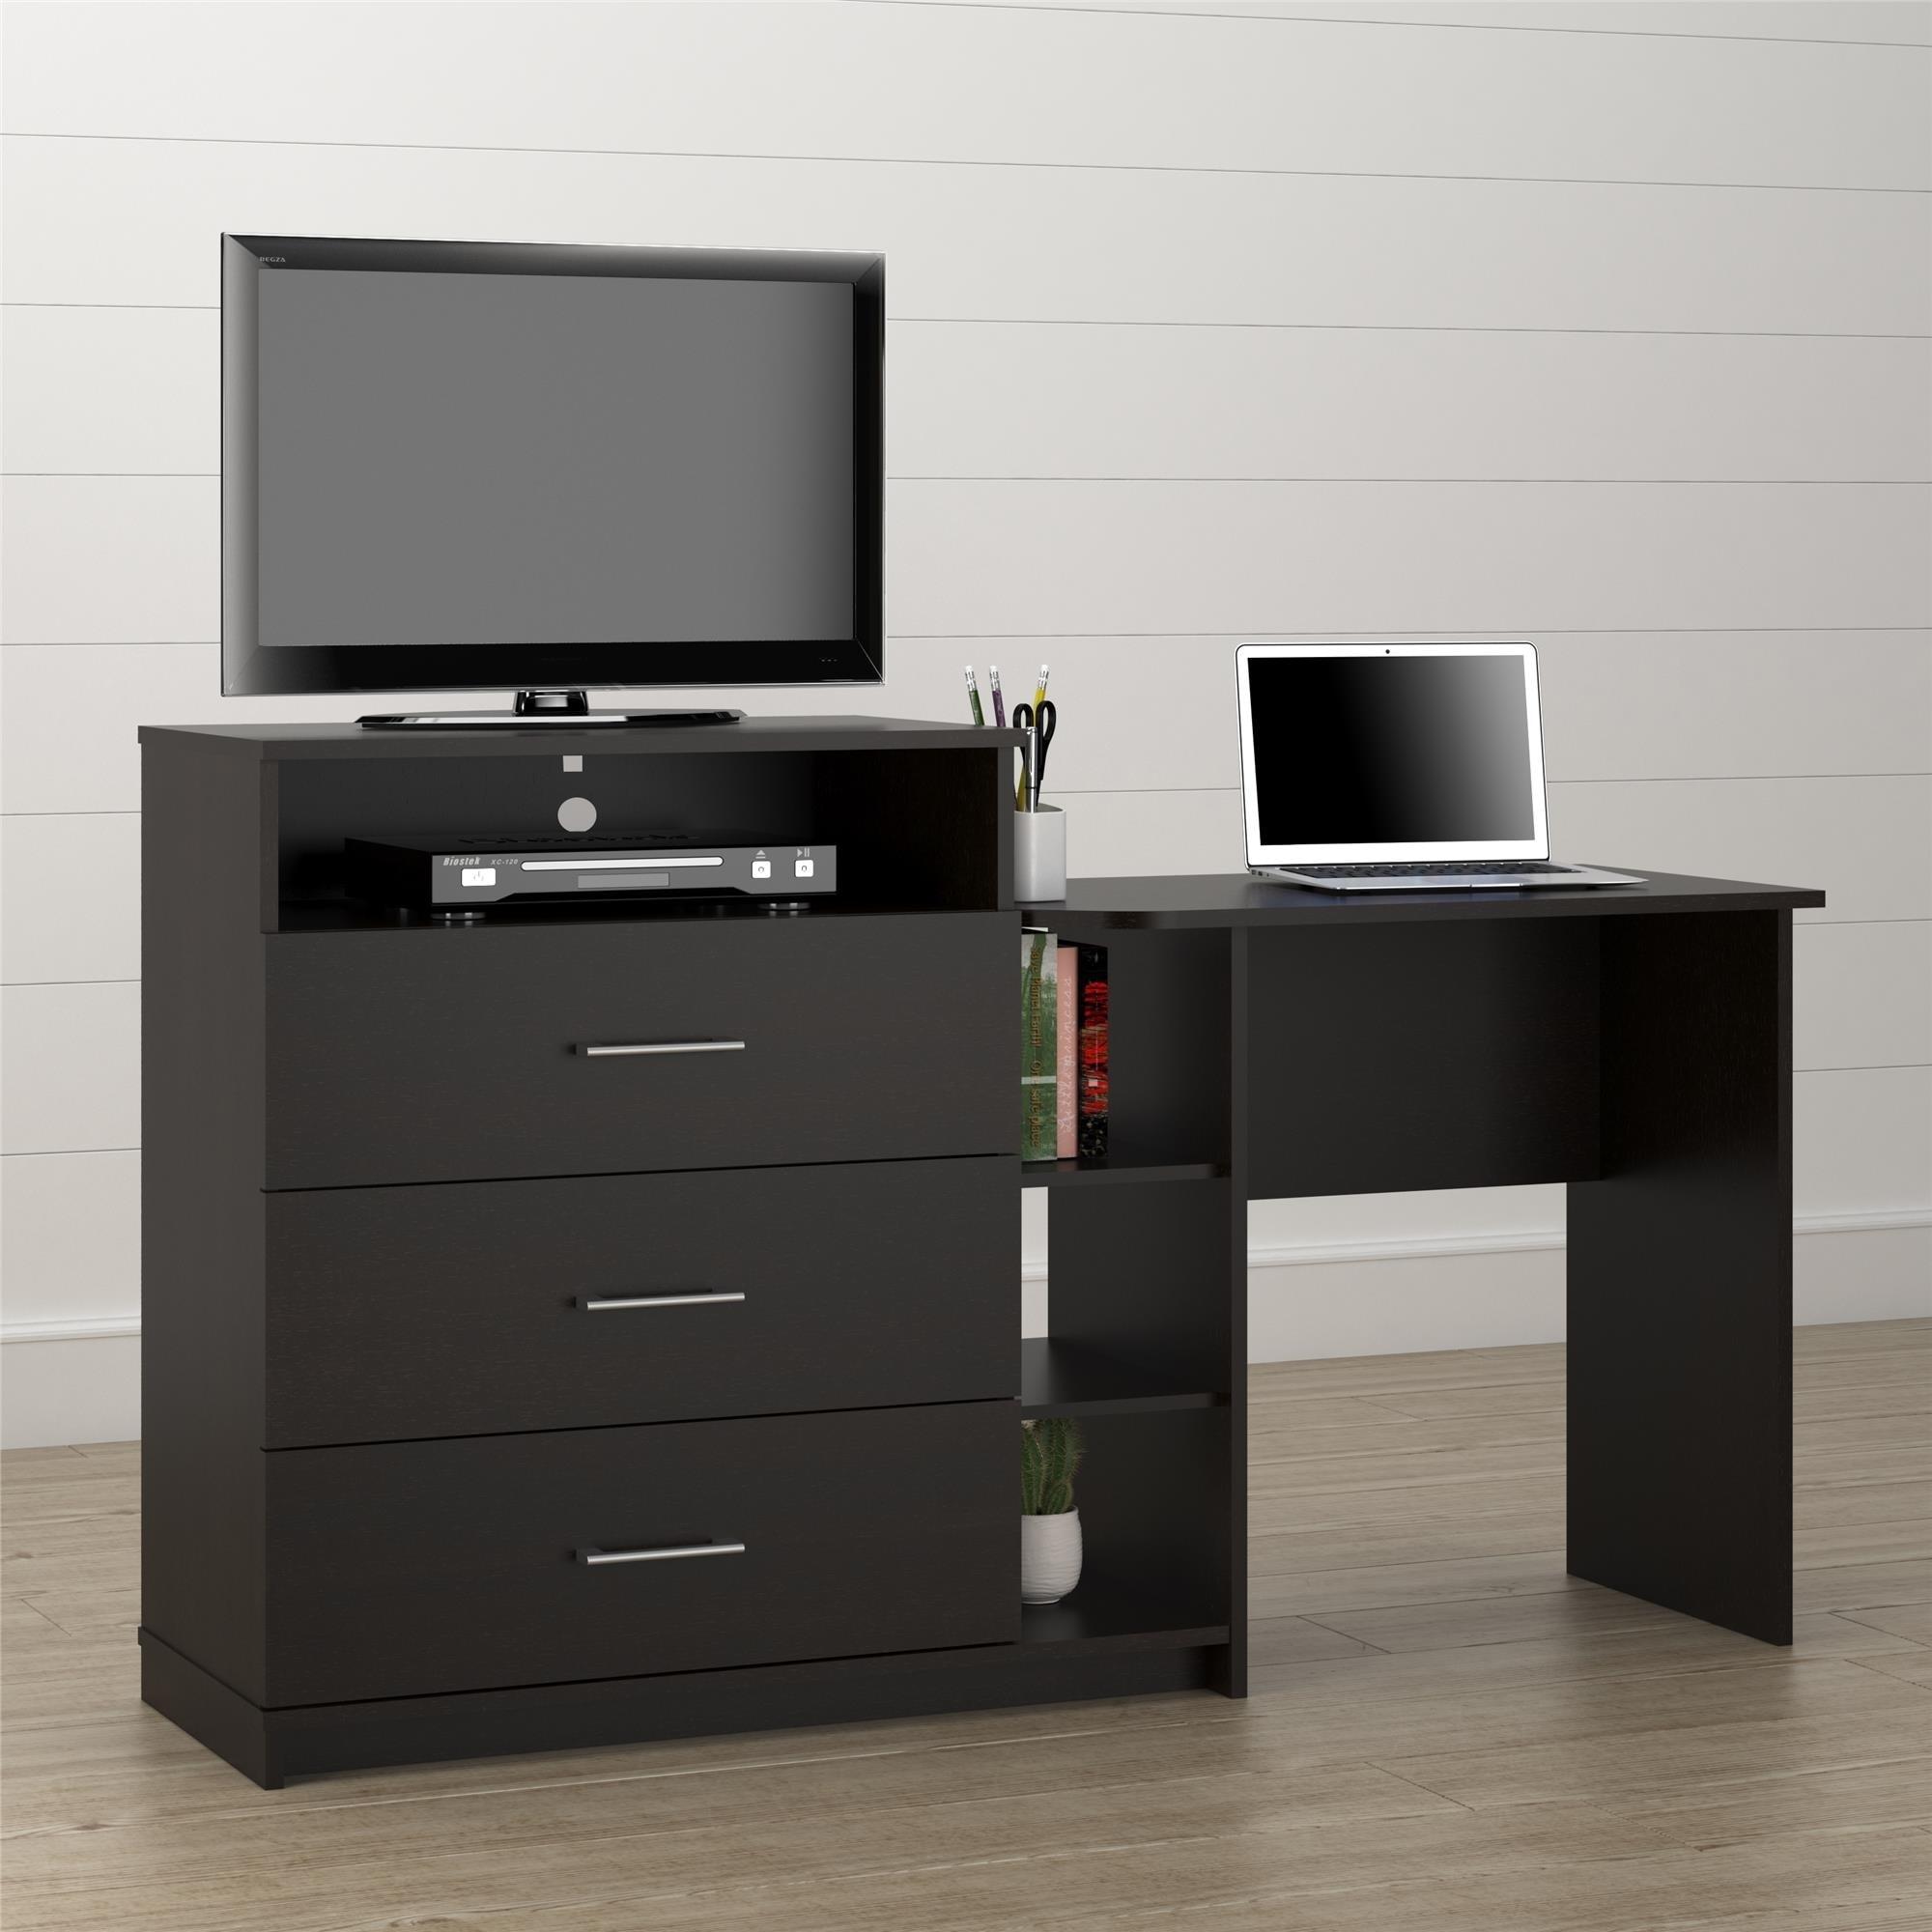 Strange Avenue Greene Lindell Espresso 3 In 1 Media Dresser And Desk Combo Home Remodeling Inspirations Cosmcuboardxyz